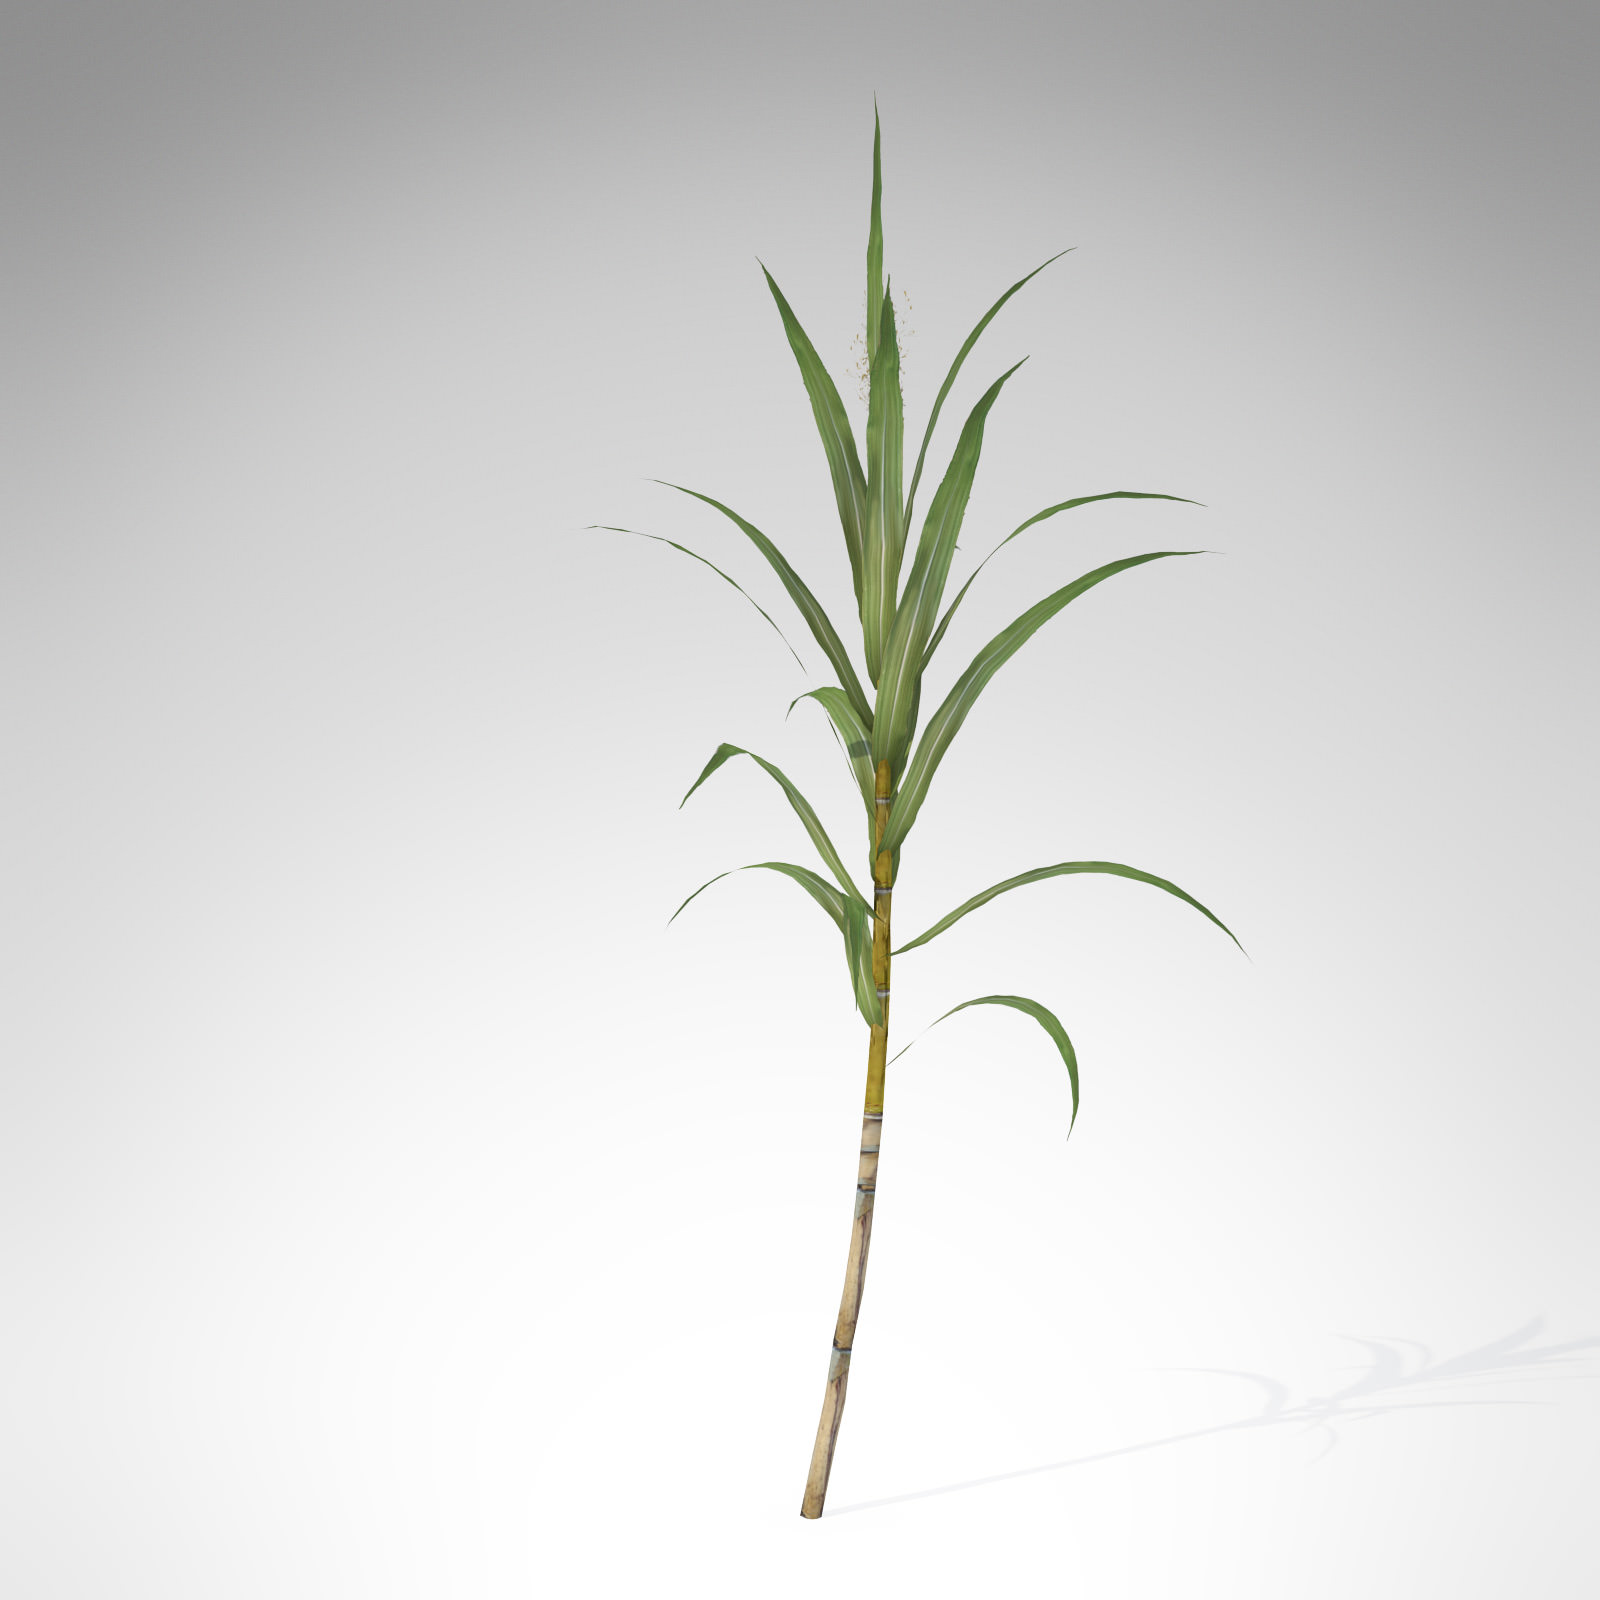 Sugarcane Clipart.